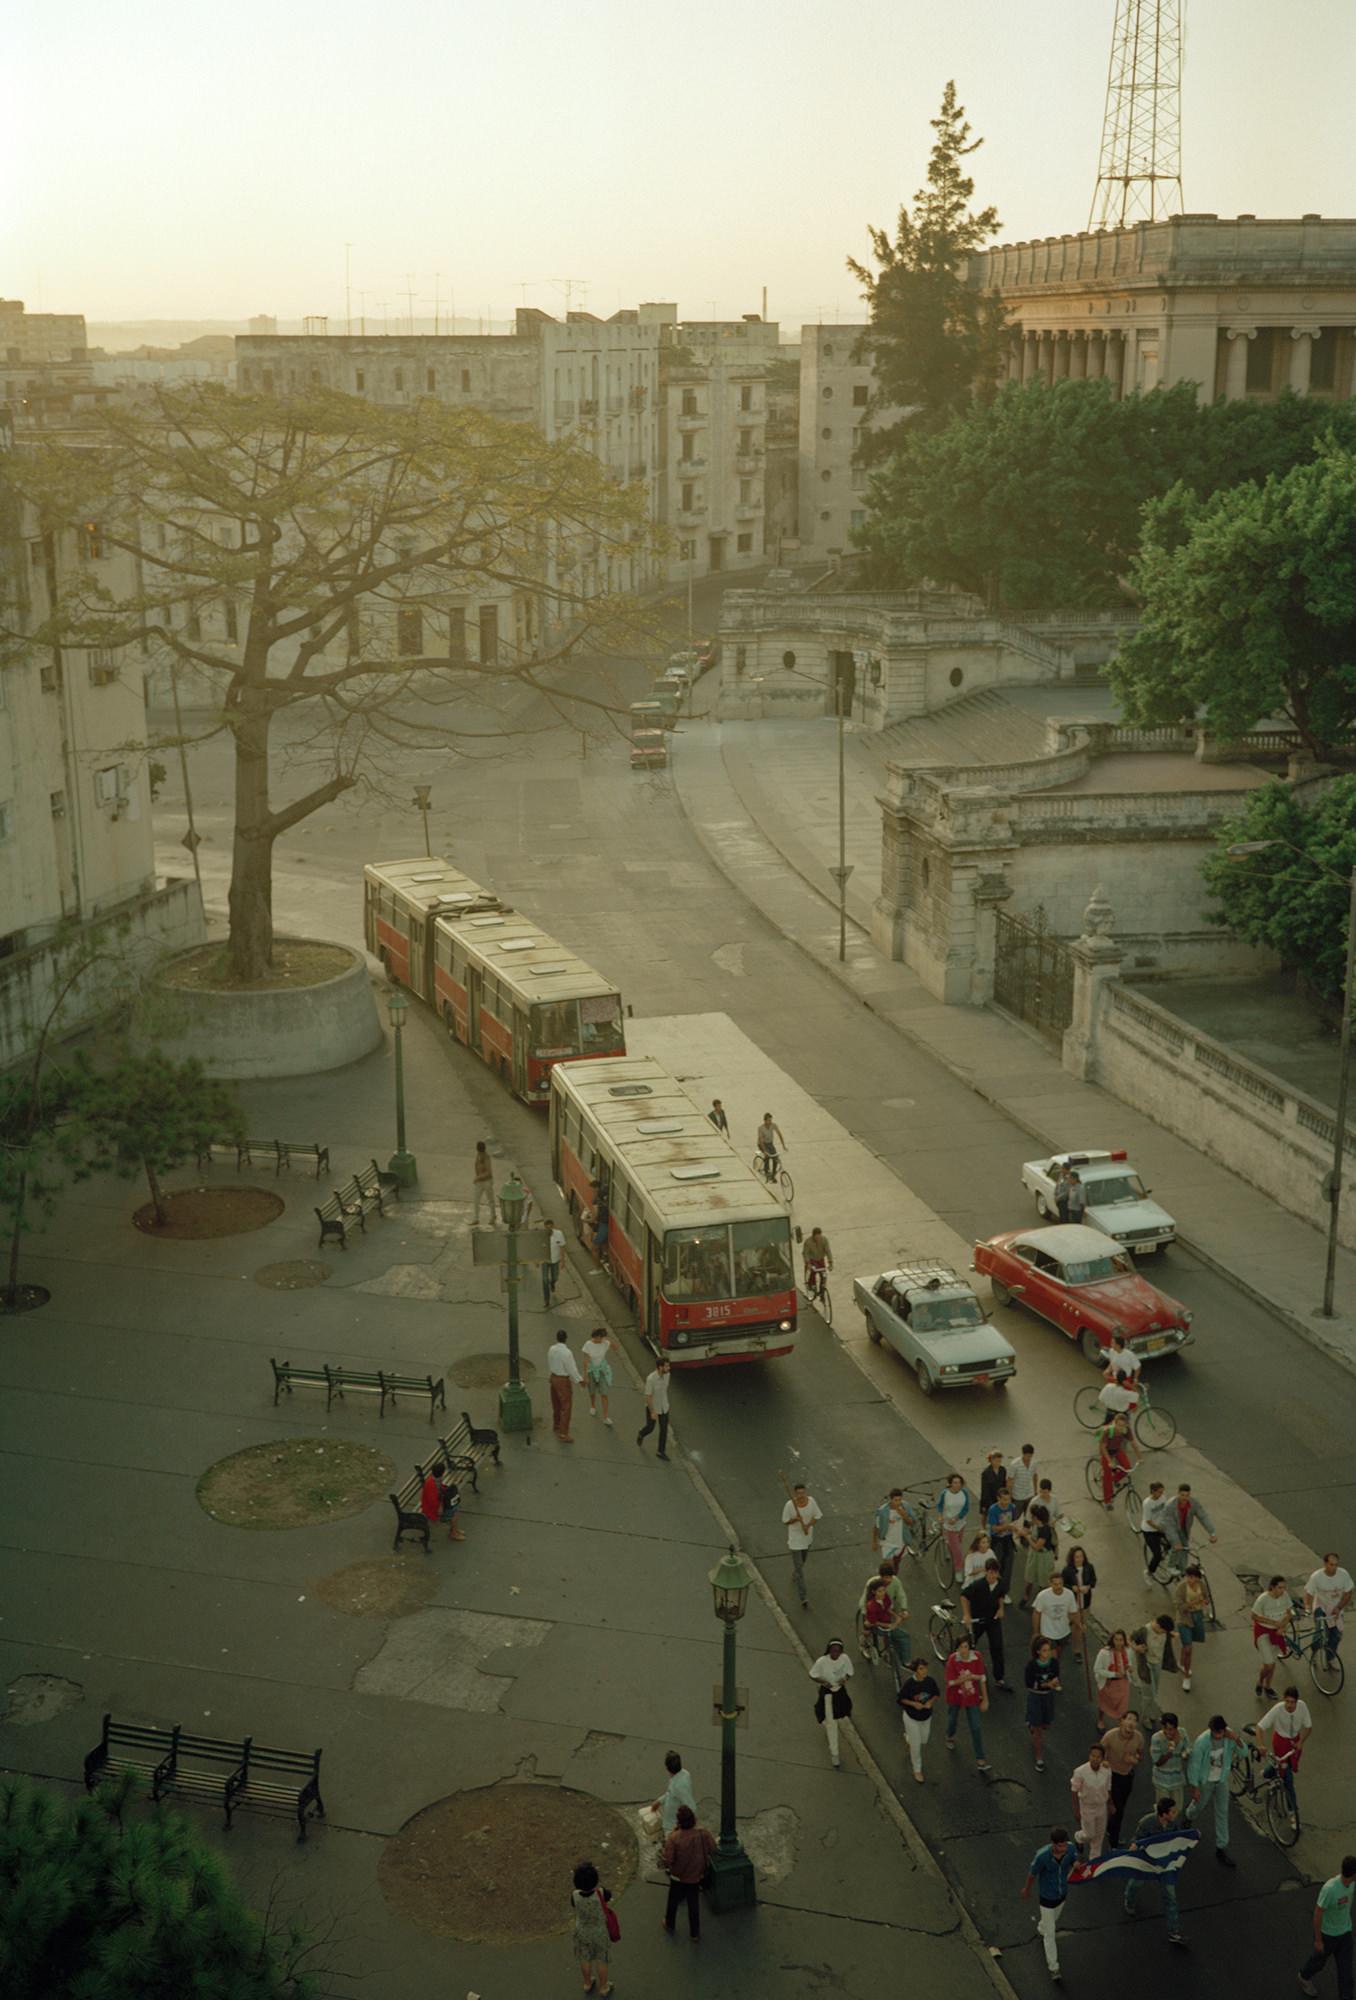 5_Bus_Stop_March_Calle_L_Havana_20_x24_pigment_print_1992.jpg